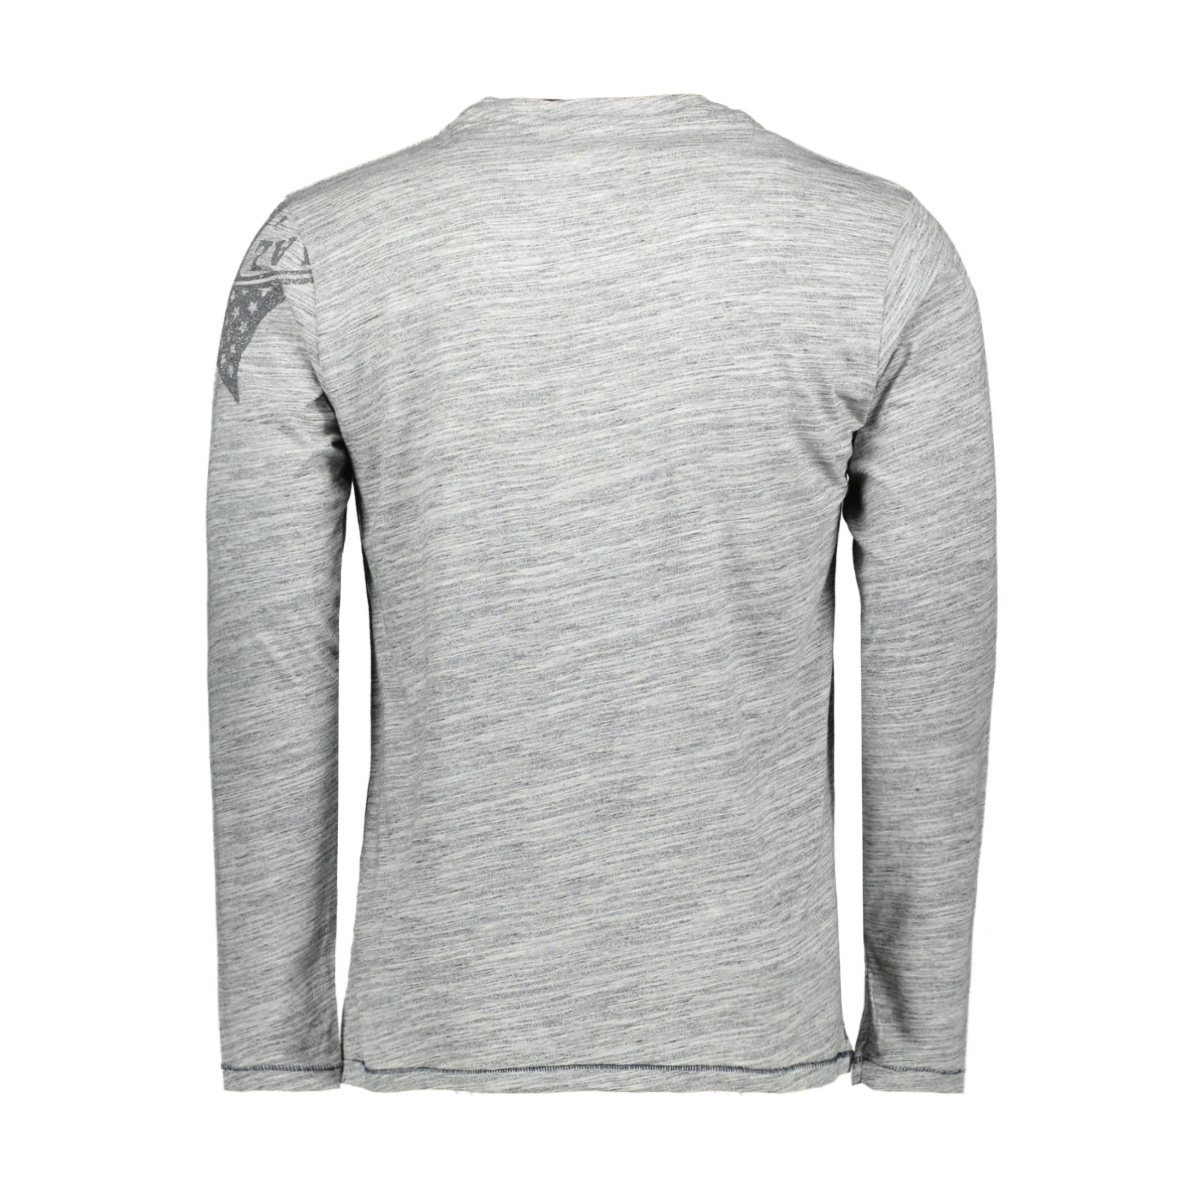 13855 gabbiano t-shirt grey